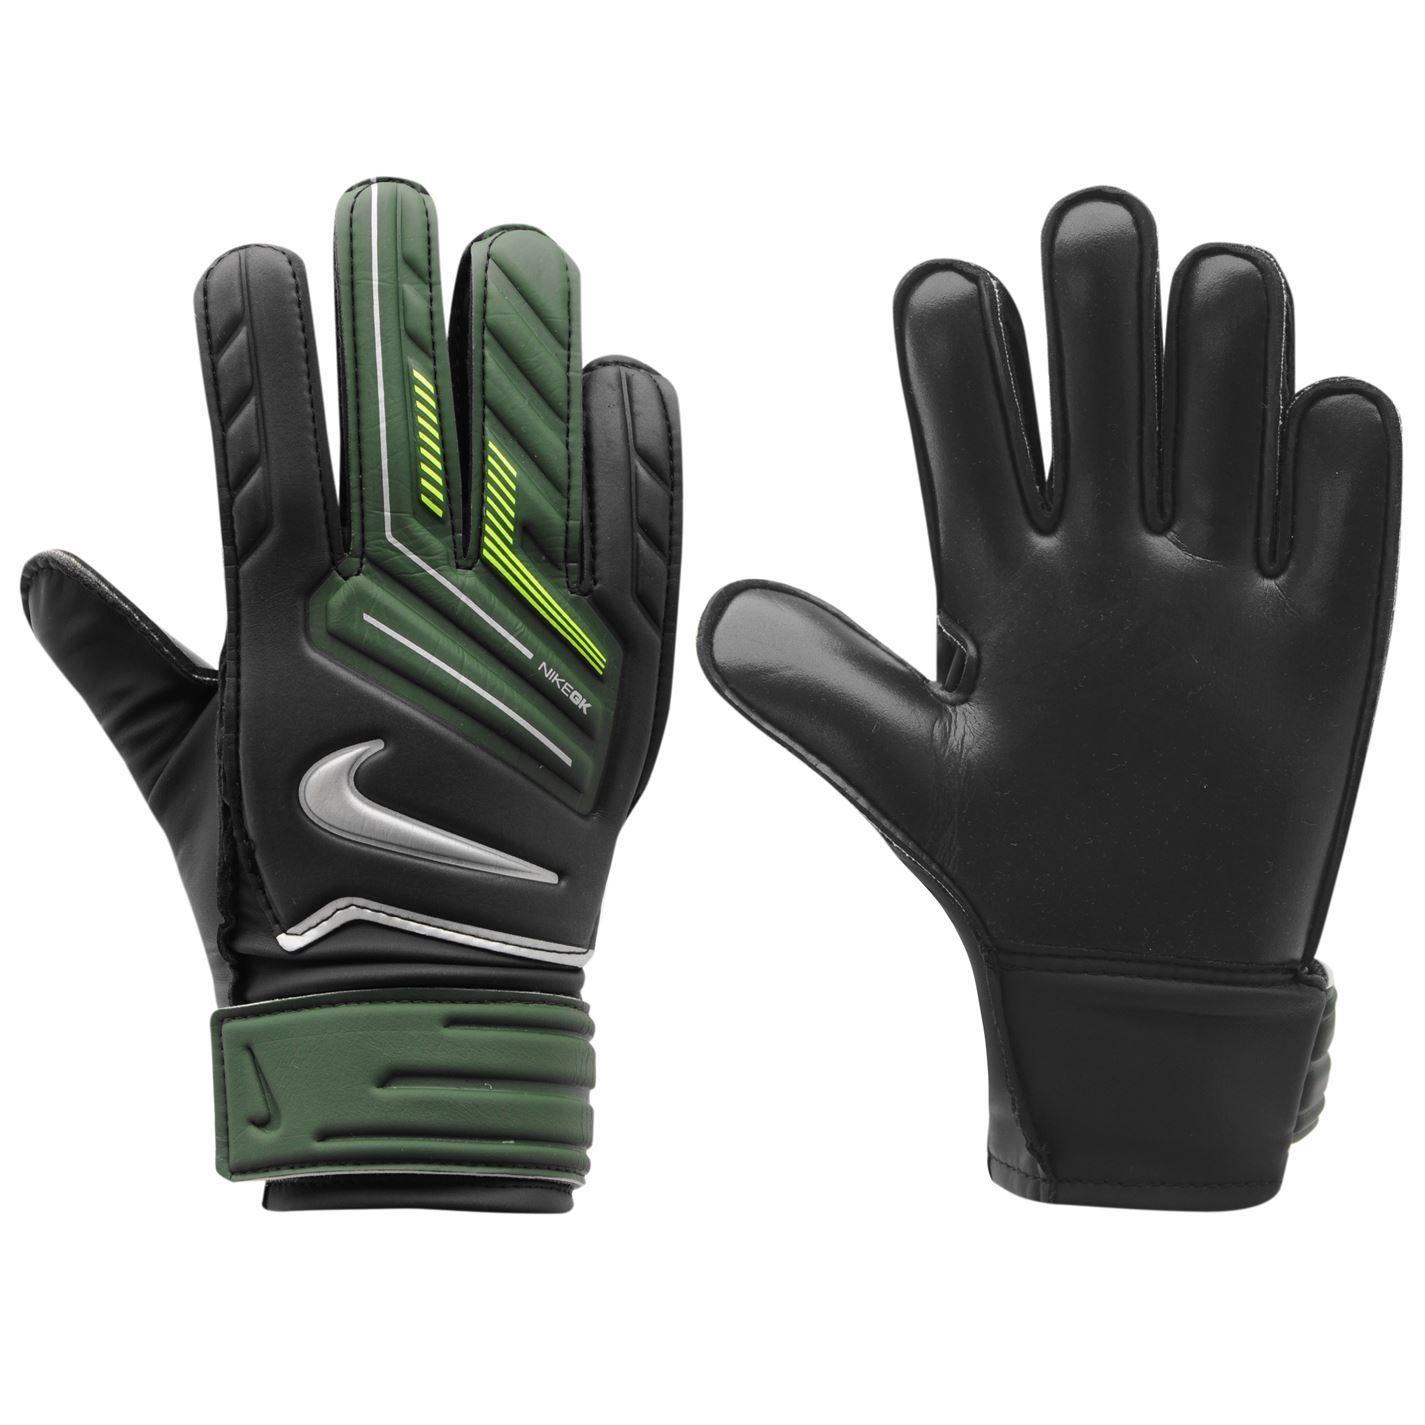 Nike Knitted Gloves Junior: Nike Match Goalkeeper Glove Junior Black/Army/Volt